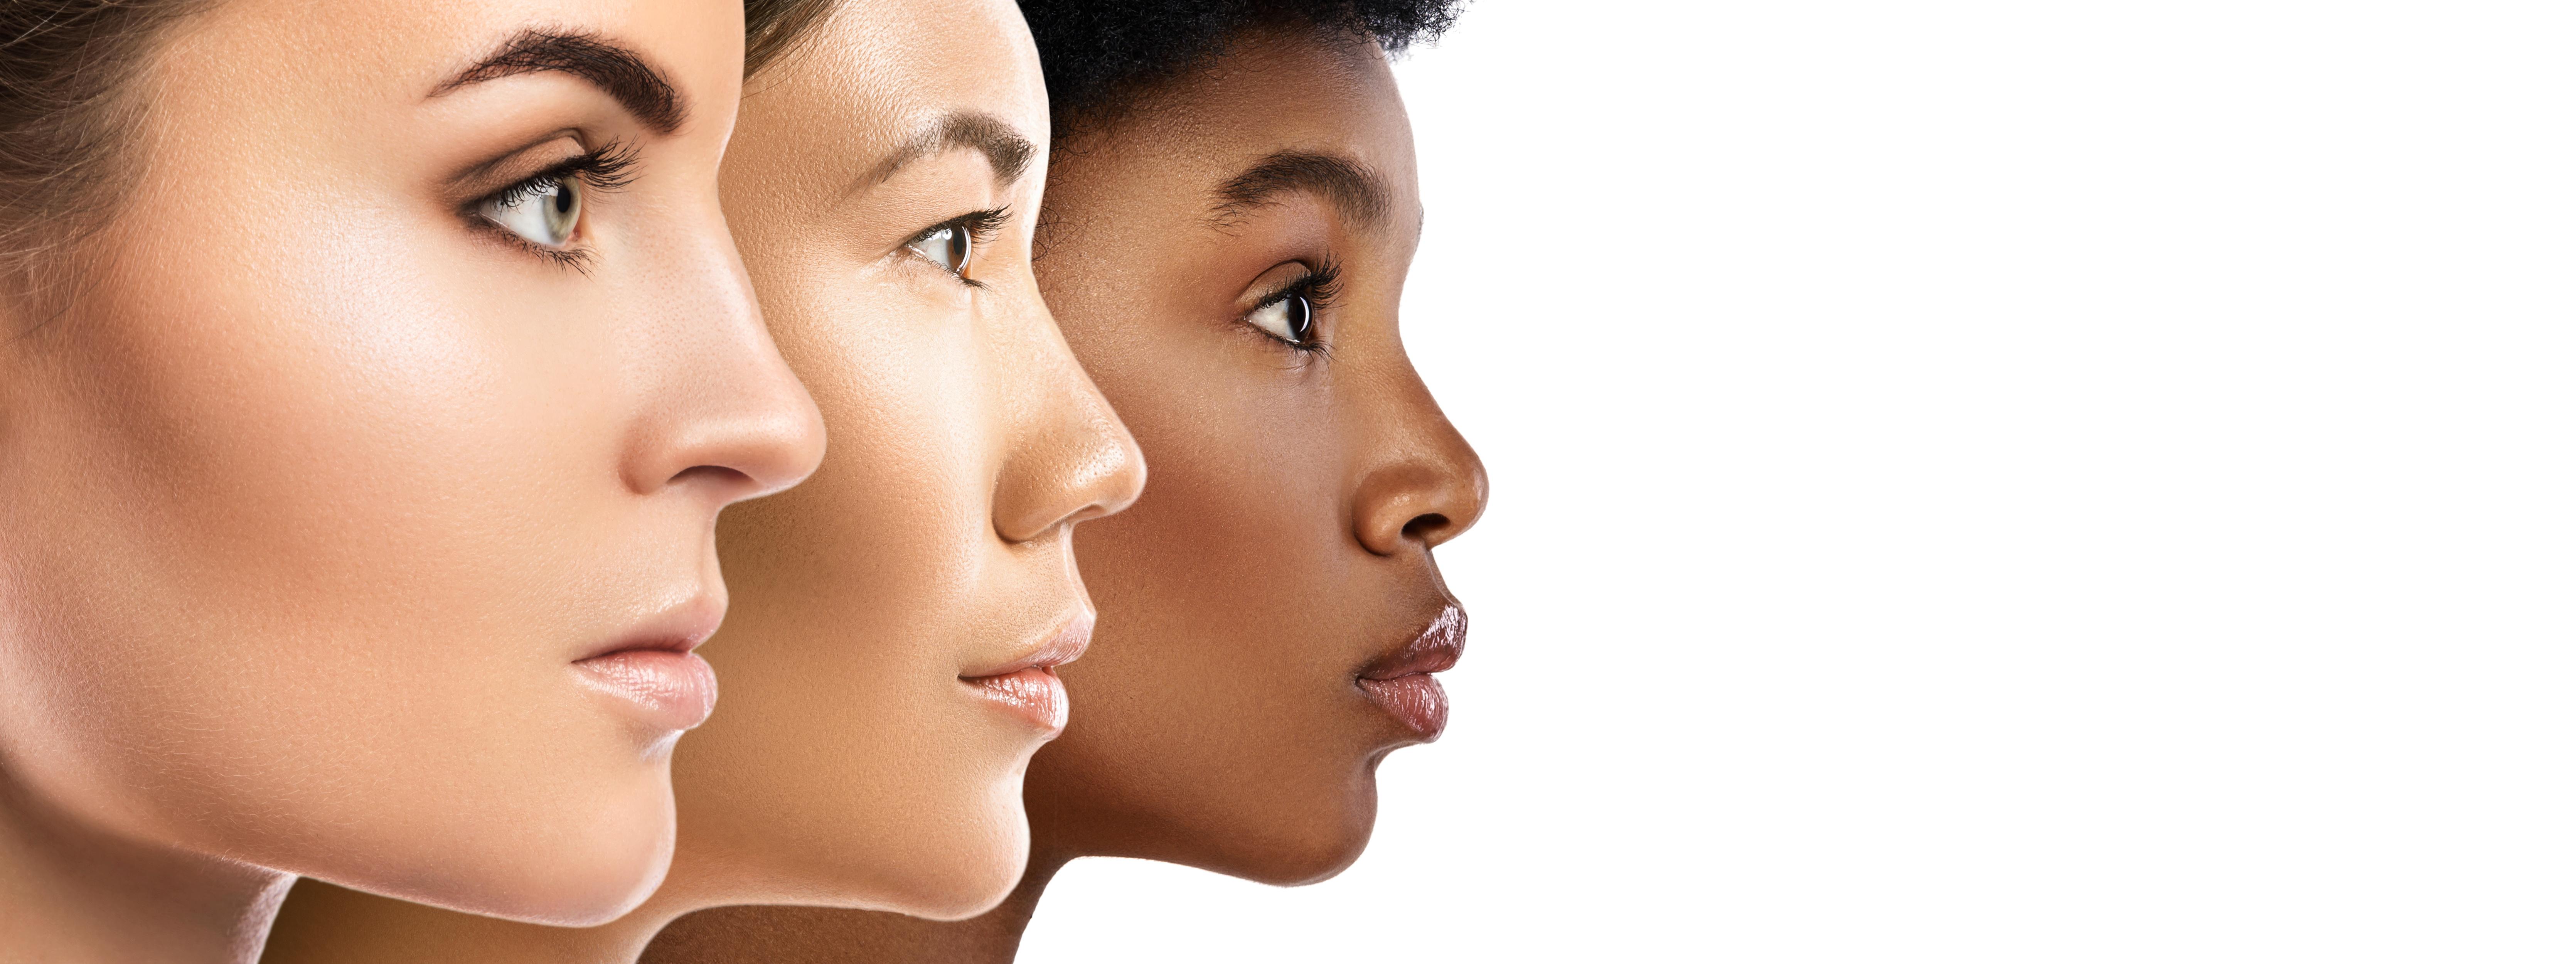 Multi-ethnic beauty. Different ethnicity women - Caucasian, African, Asian.